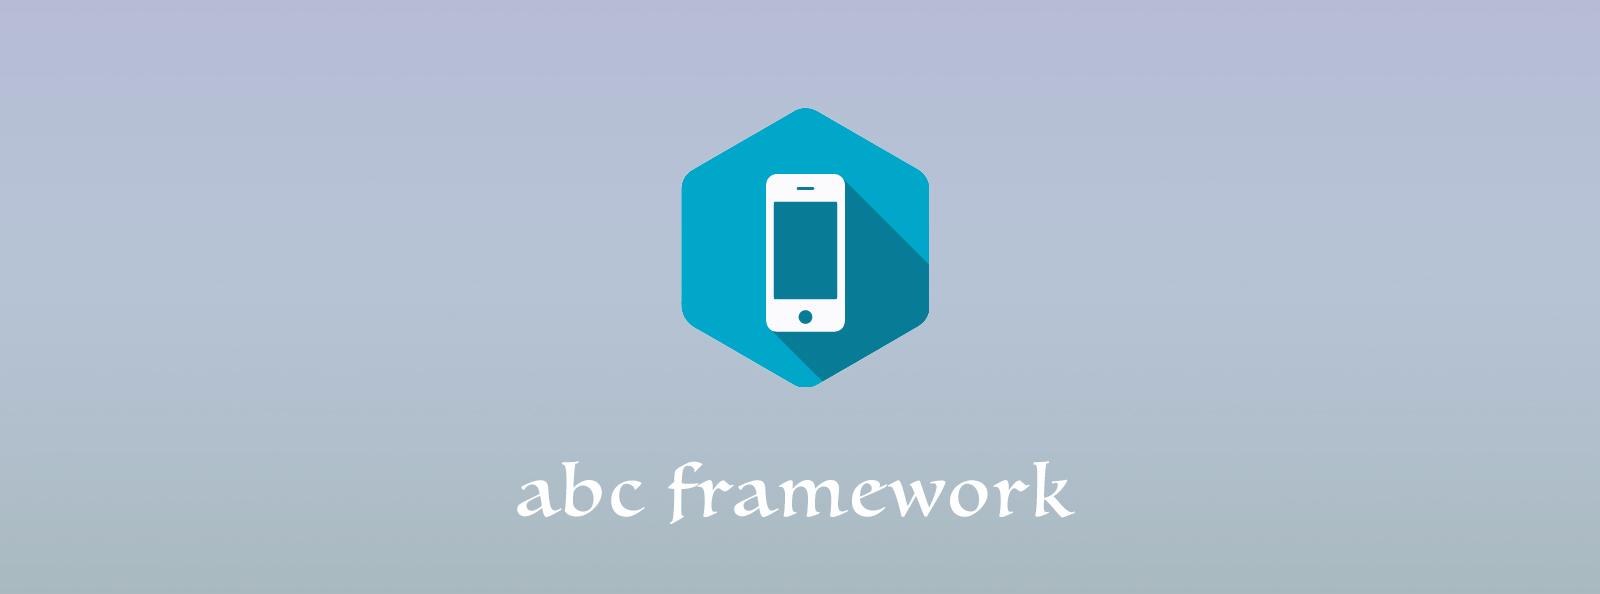 Abc framework